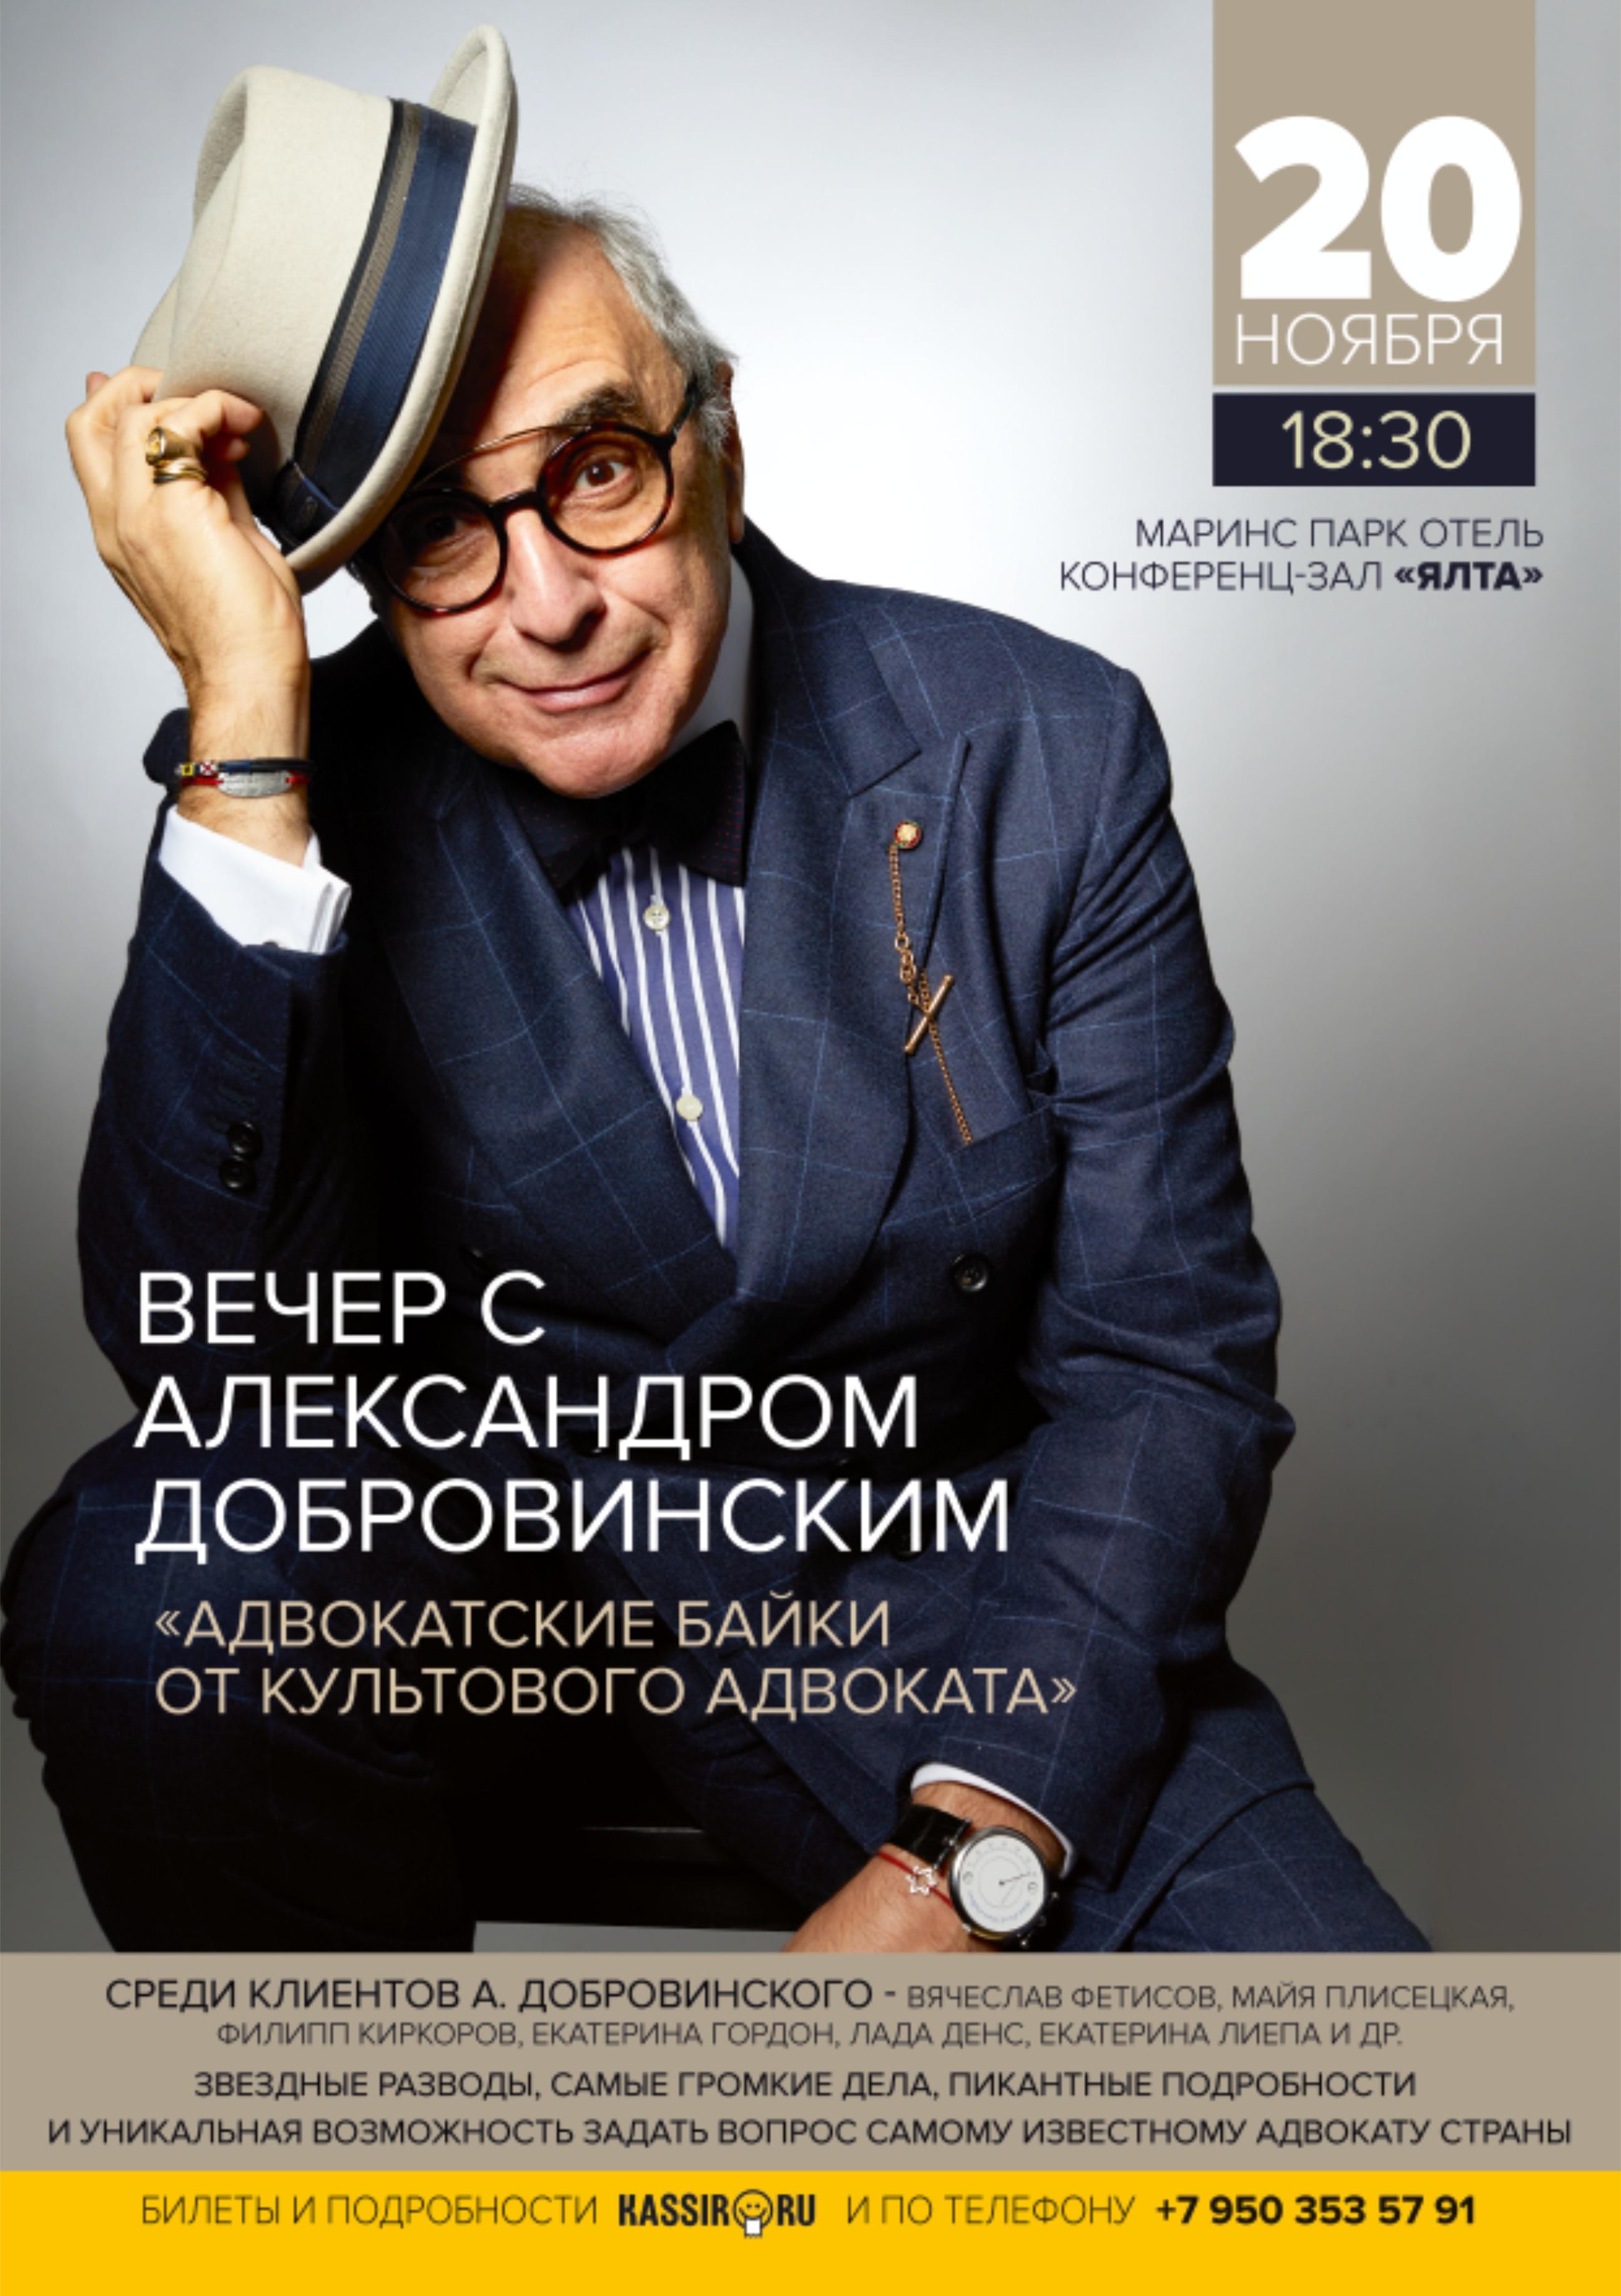 Вечер с Александром Добровинским «Адвокатские байки»